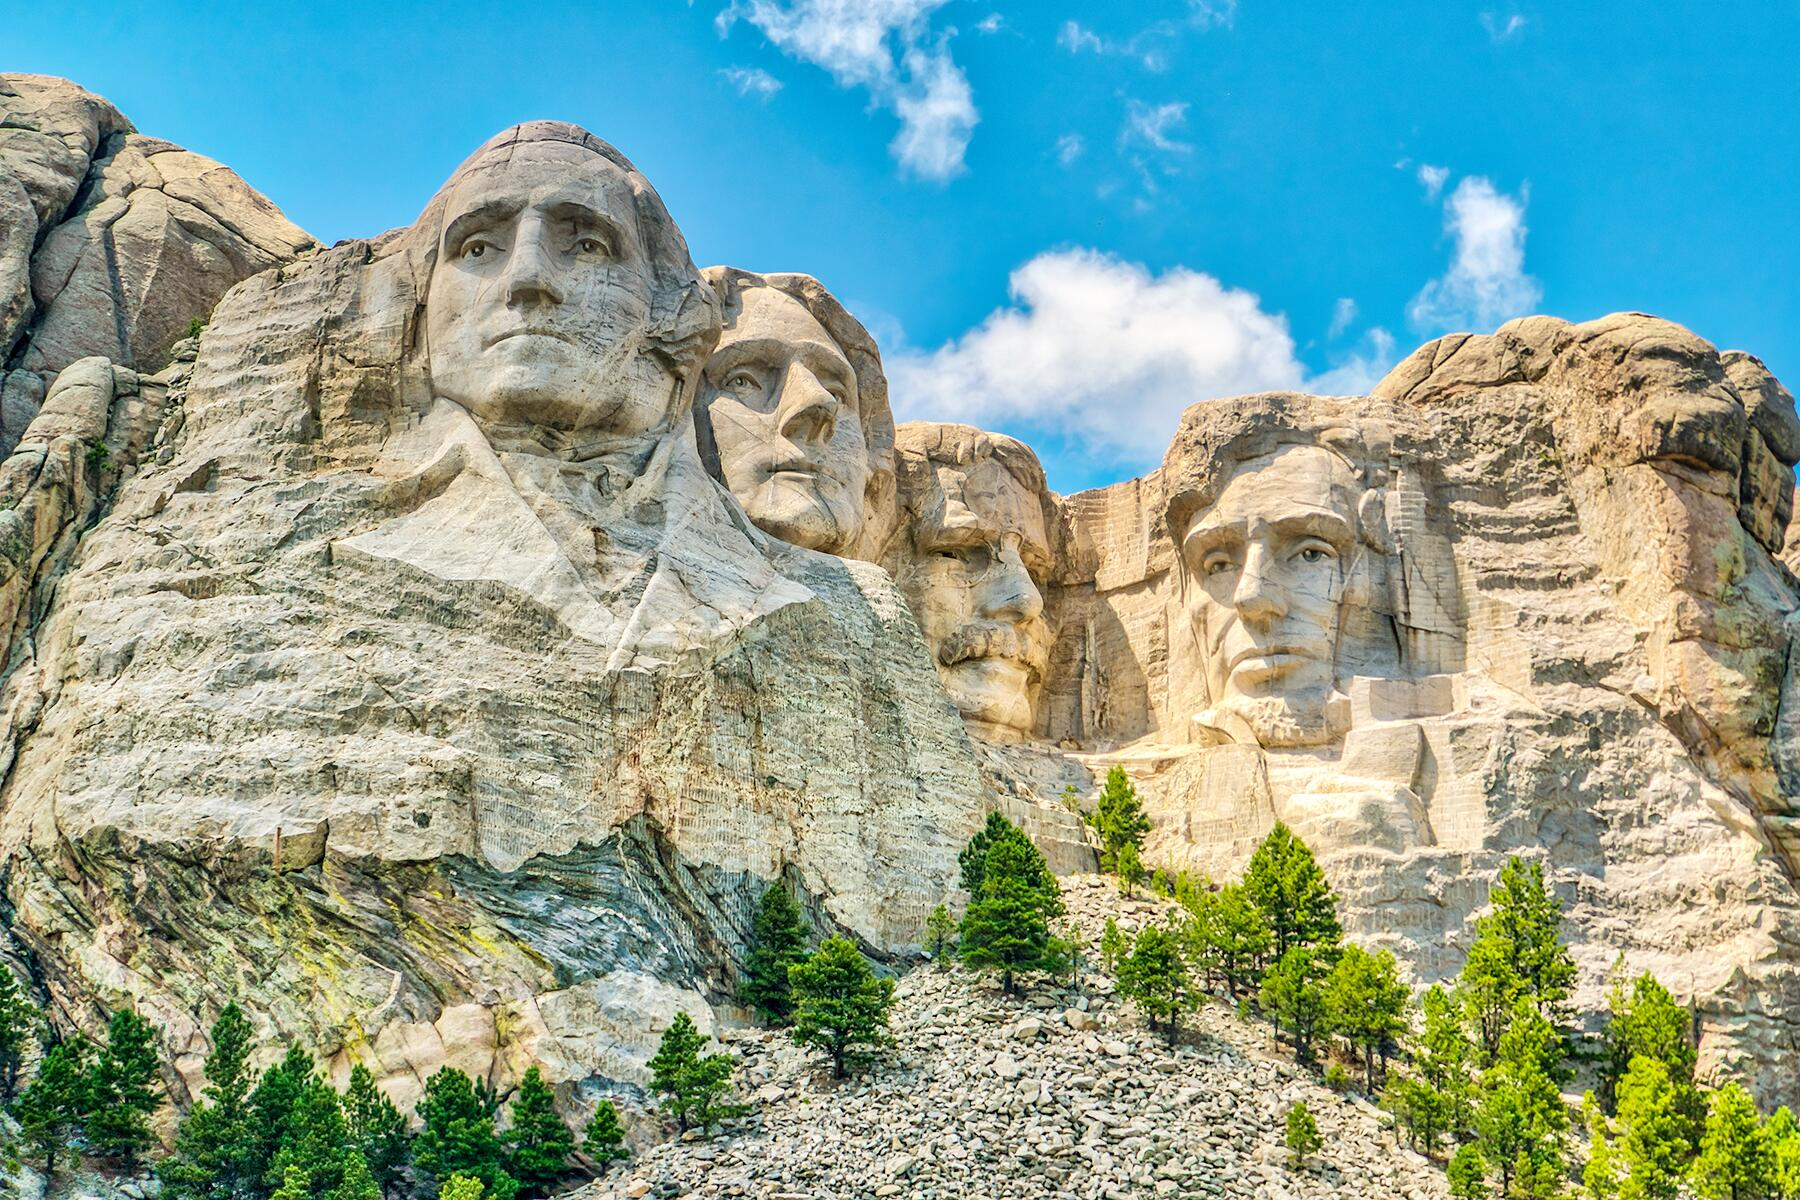 Badlands National Park to Mount Rushmore, South Dakota